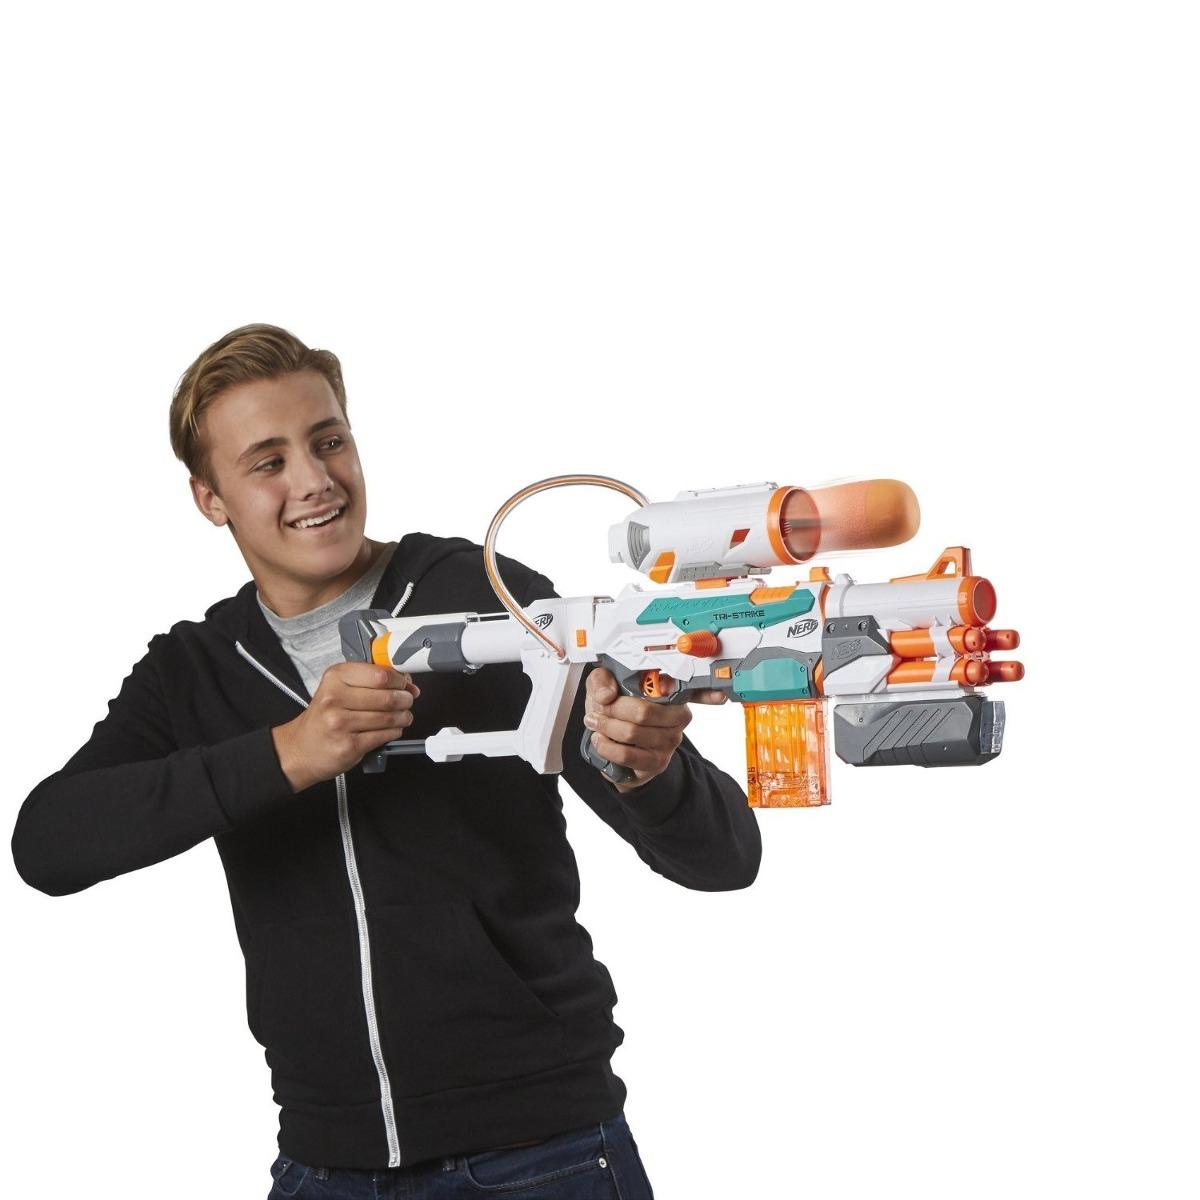 Lançador Nerf  Modulus Tri – Strike  - 14 dardos + 1 Míssil - Hasbro  - Doce Diversão